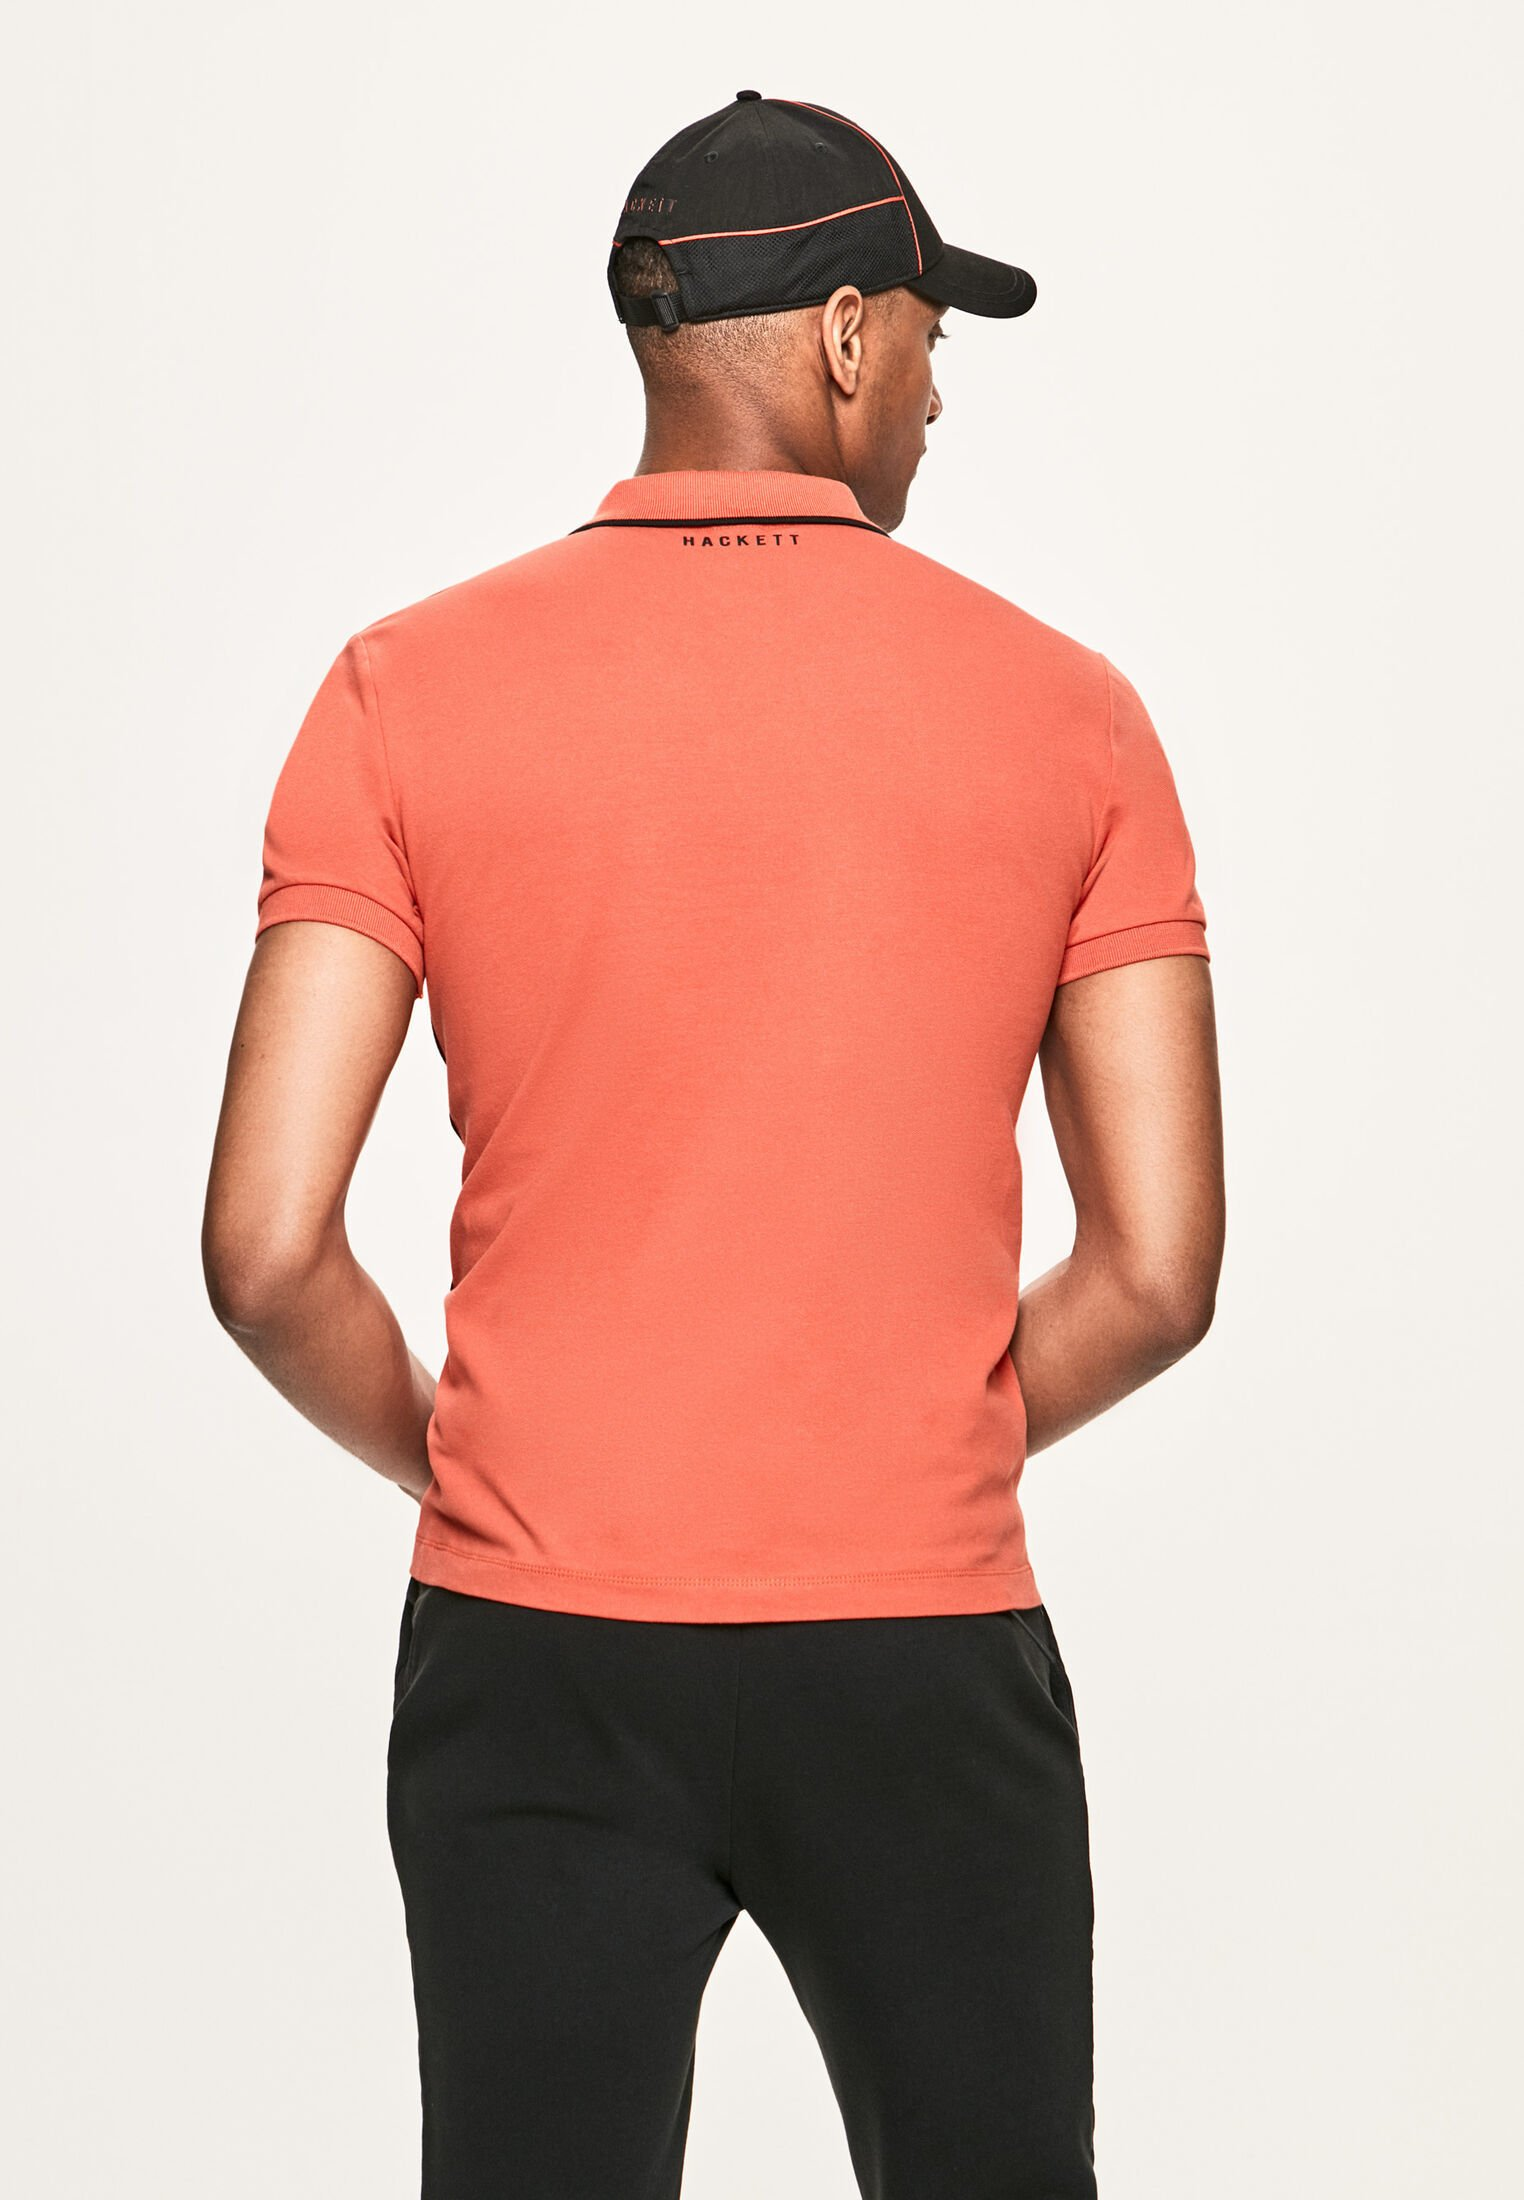 Hackett London Polo shirt - burnt orange f7Xci